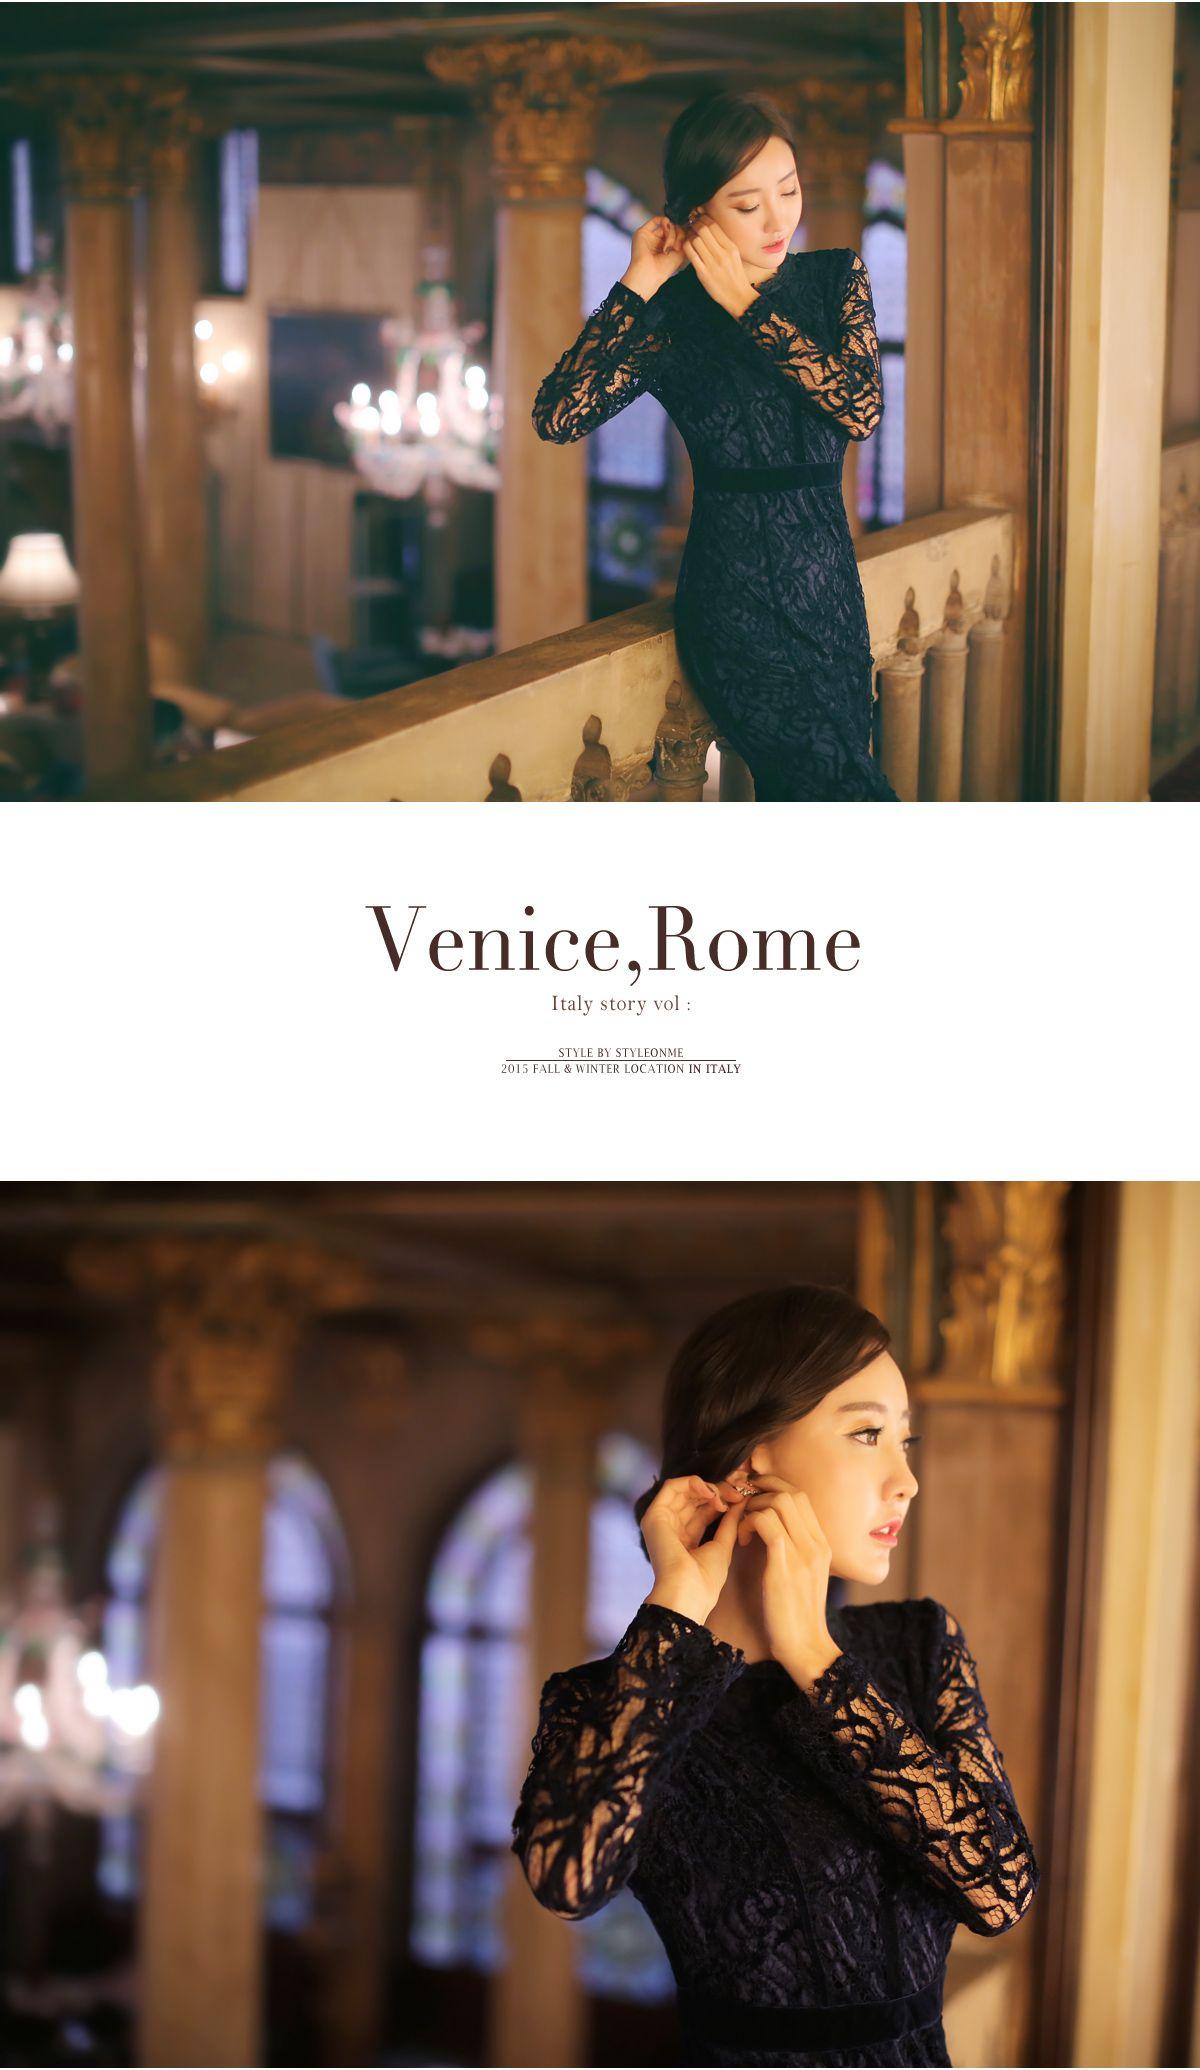 Styleonme_Elegant Velvet Laced Dress #elegant #dress #seethrough #lace